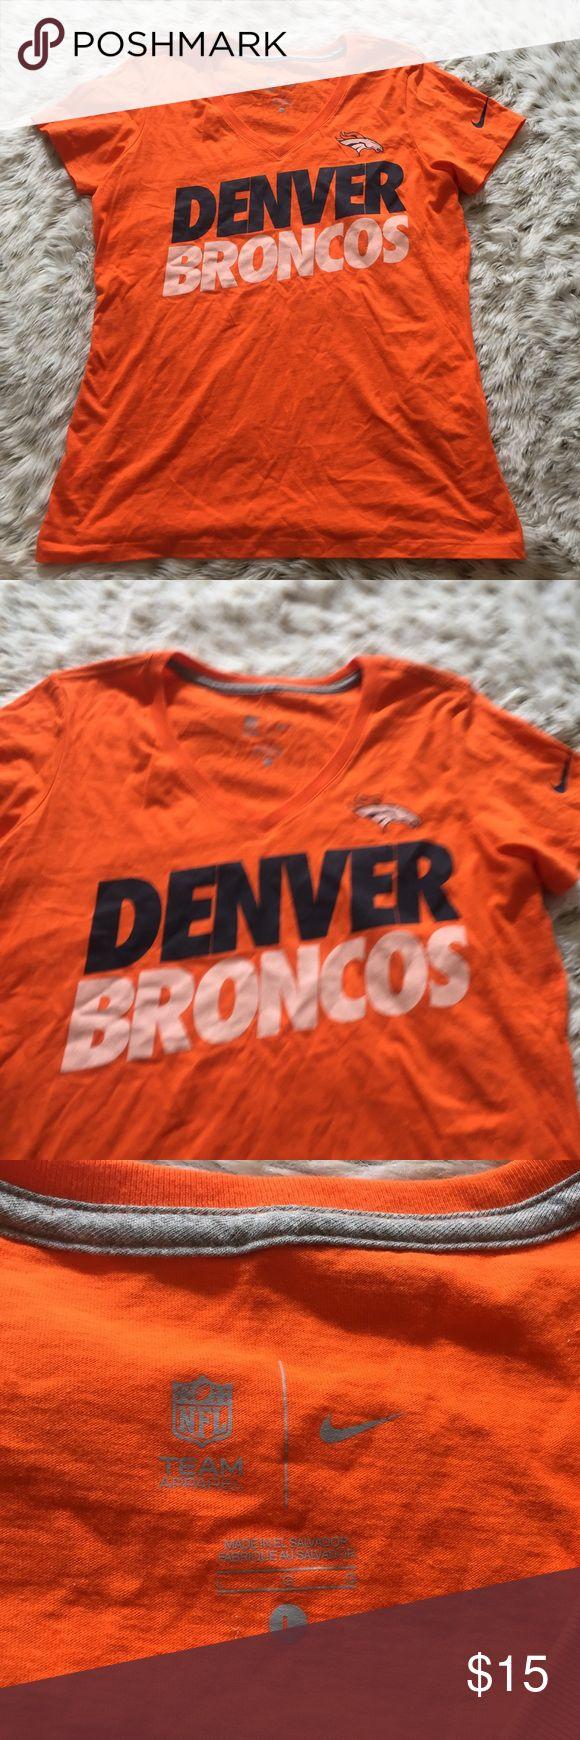 Nike Denver Broncos T shirt Nike women's size large orange and blue v neck t shirt! Denver broncos Nfl t shirt! Excellent used condition! Get ready for football season! Nike Tops Tees - Short Sleeve